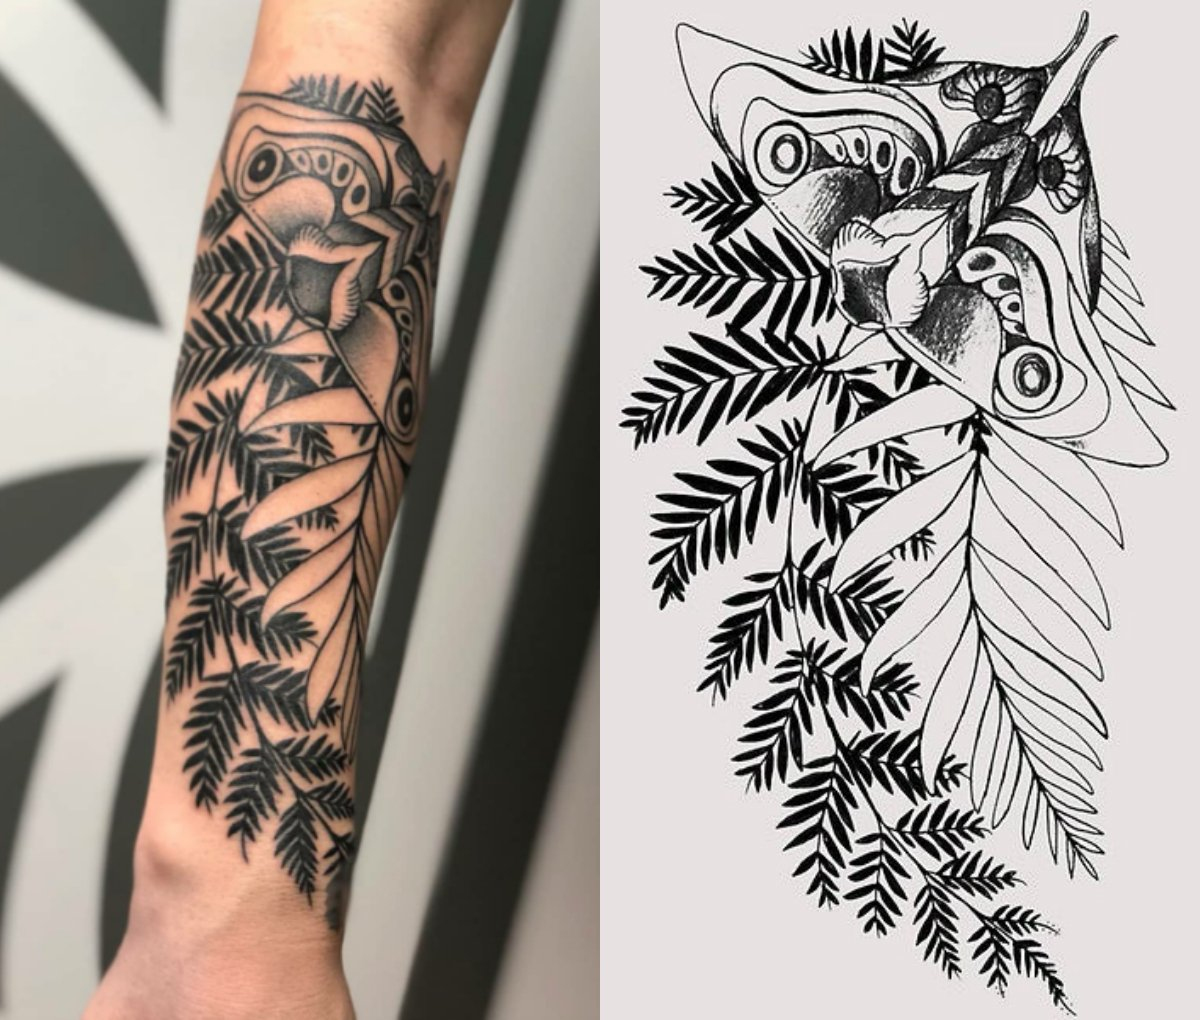 Ellie's tattoo, The Last of Us part 2 Tatuagens legais